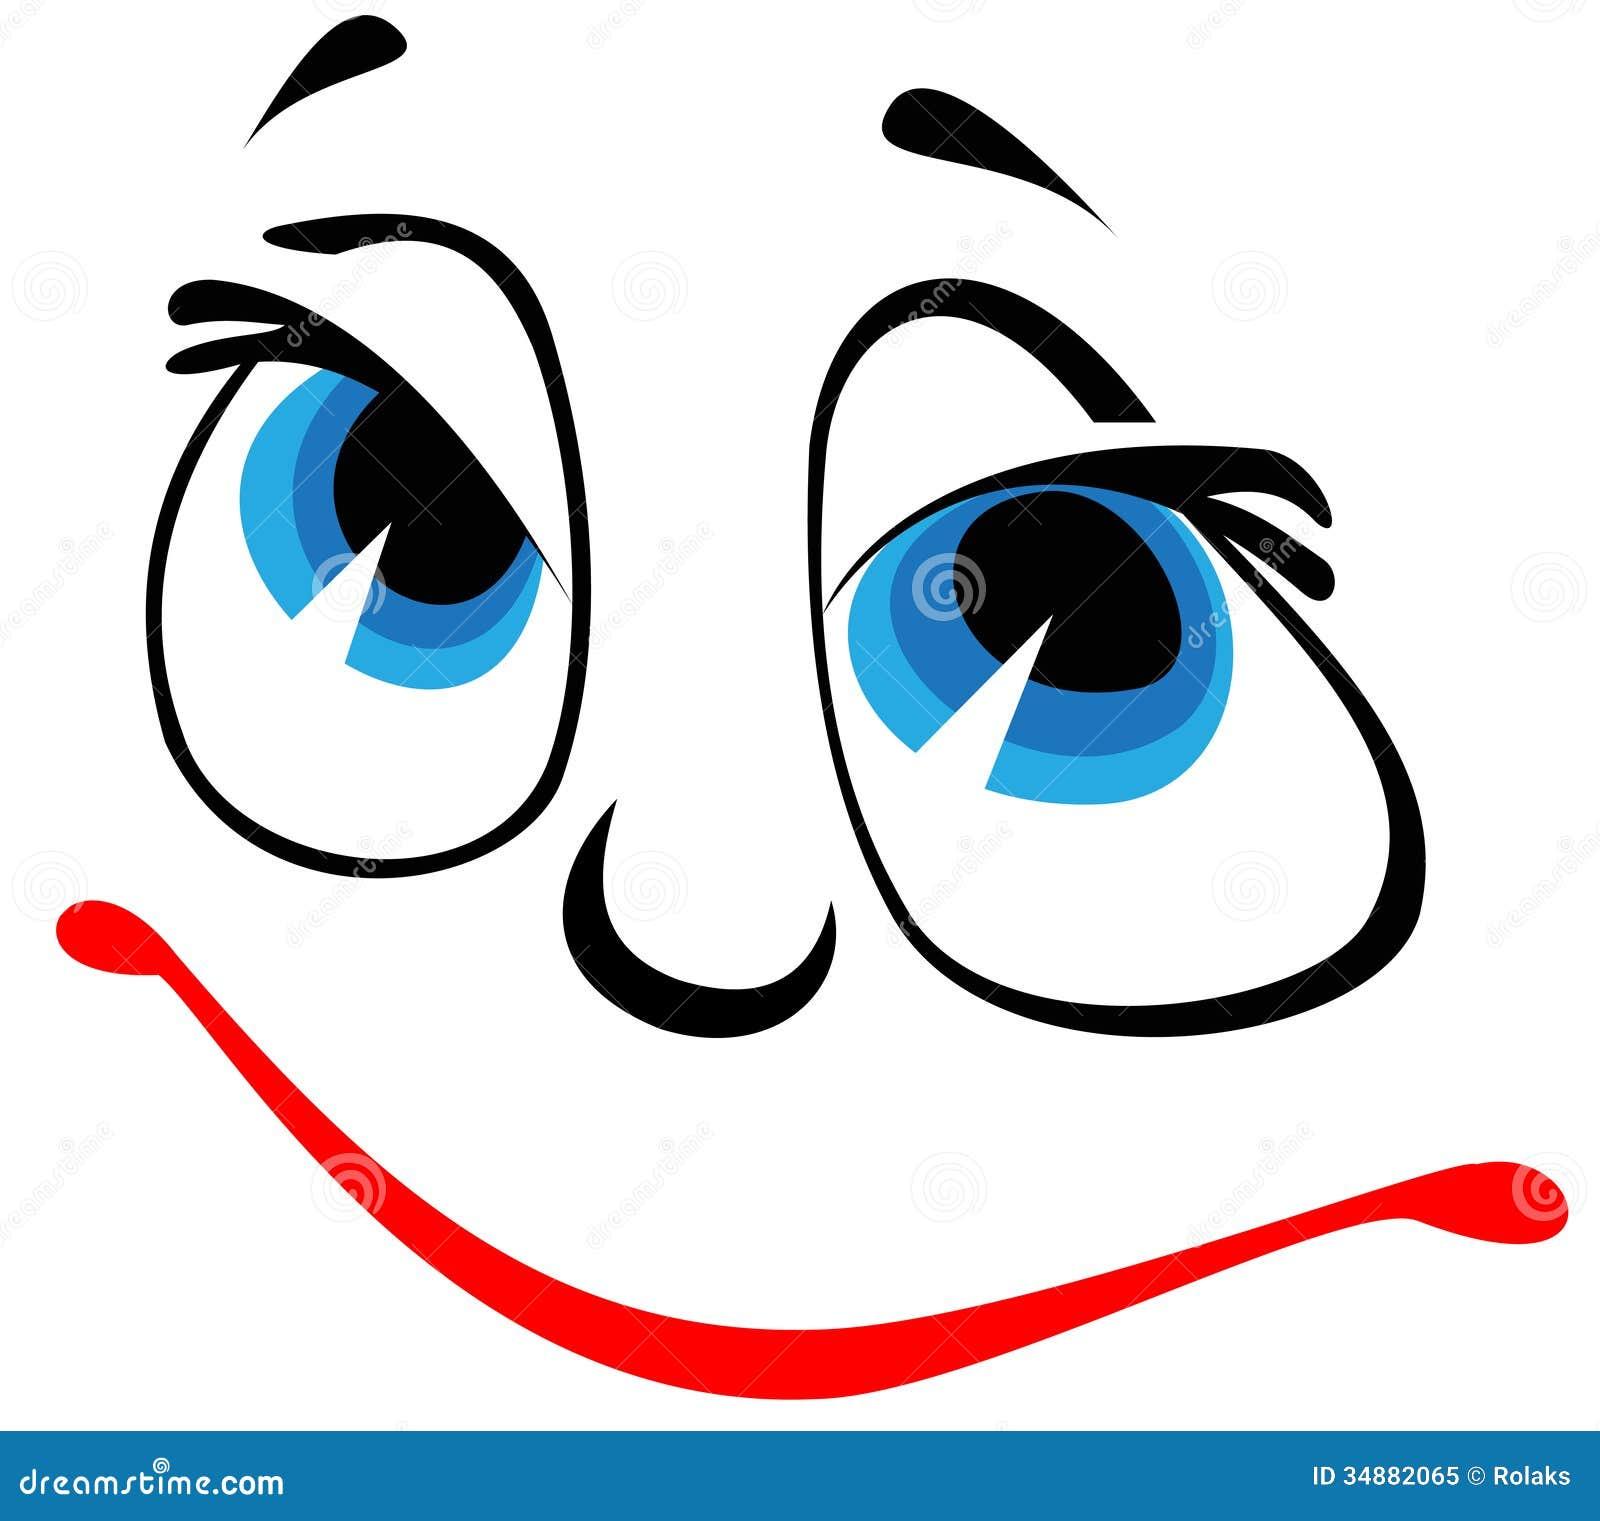 https://thumbs.dreamstime.com/z/funny-smiley-illustration-smiling-cartoon-faces-34882065.jpg